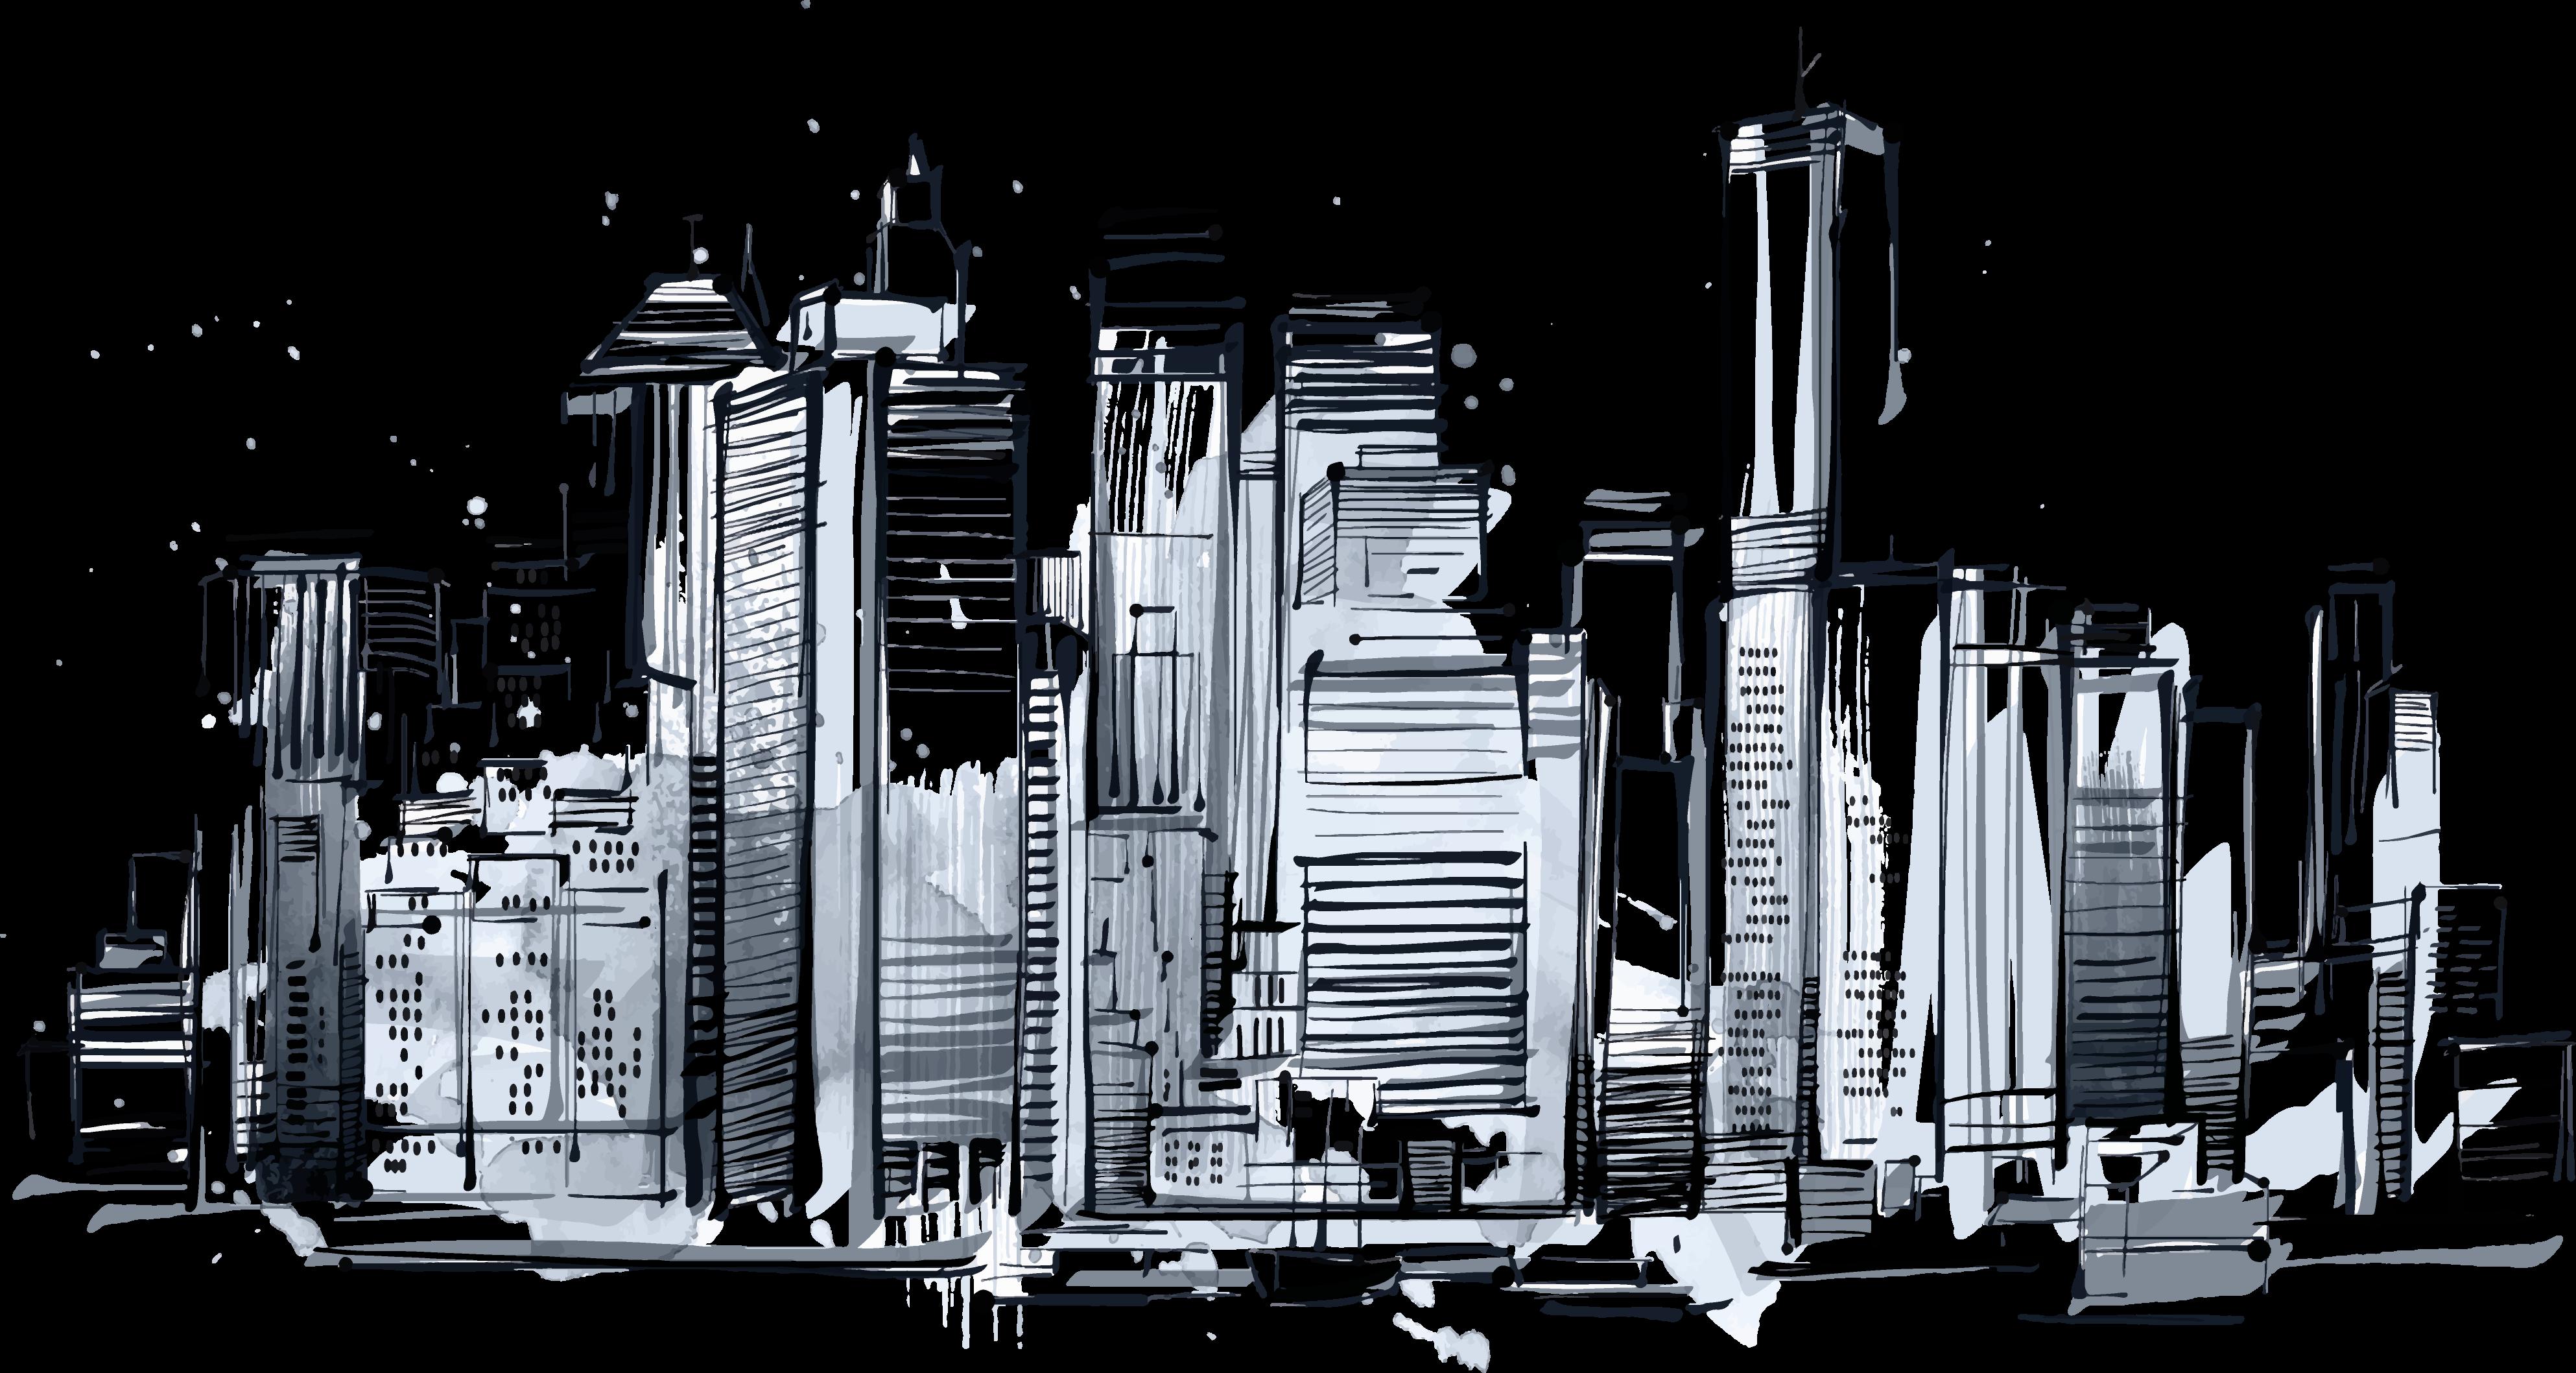 Skyline Drawing Skyscraper 193 Skyline Drawing Skyline Drawings